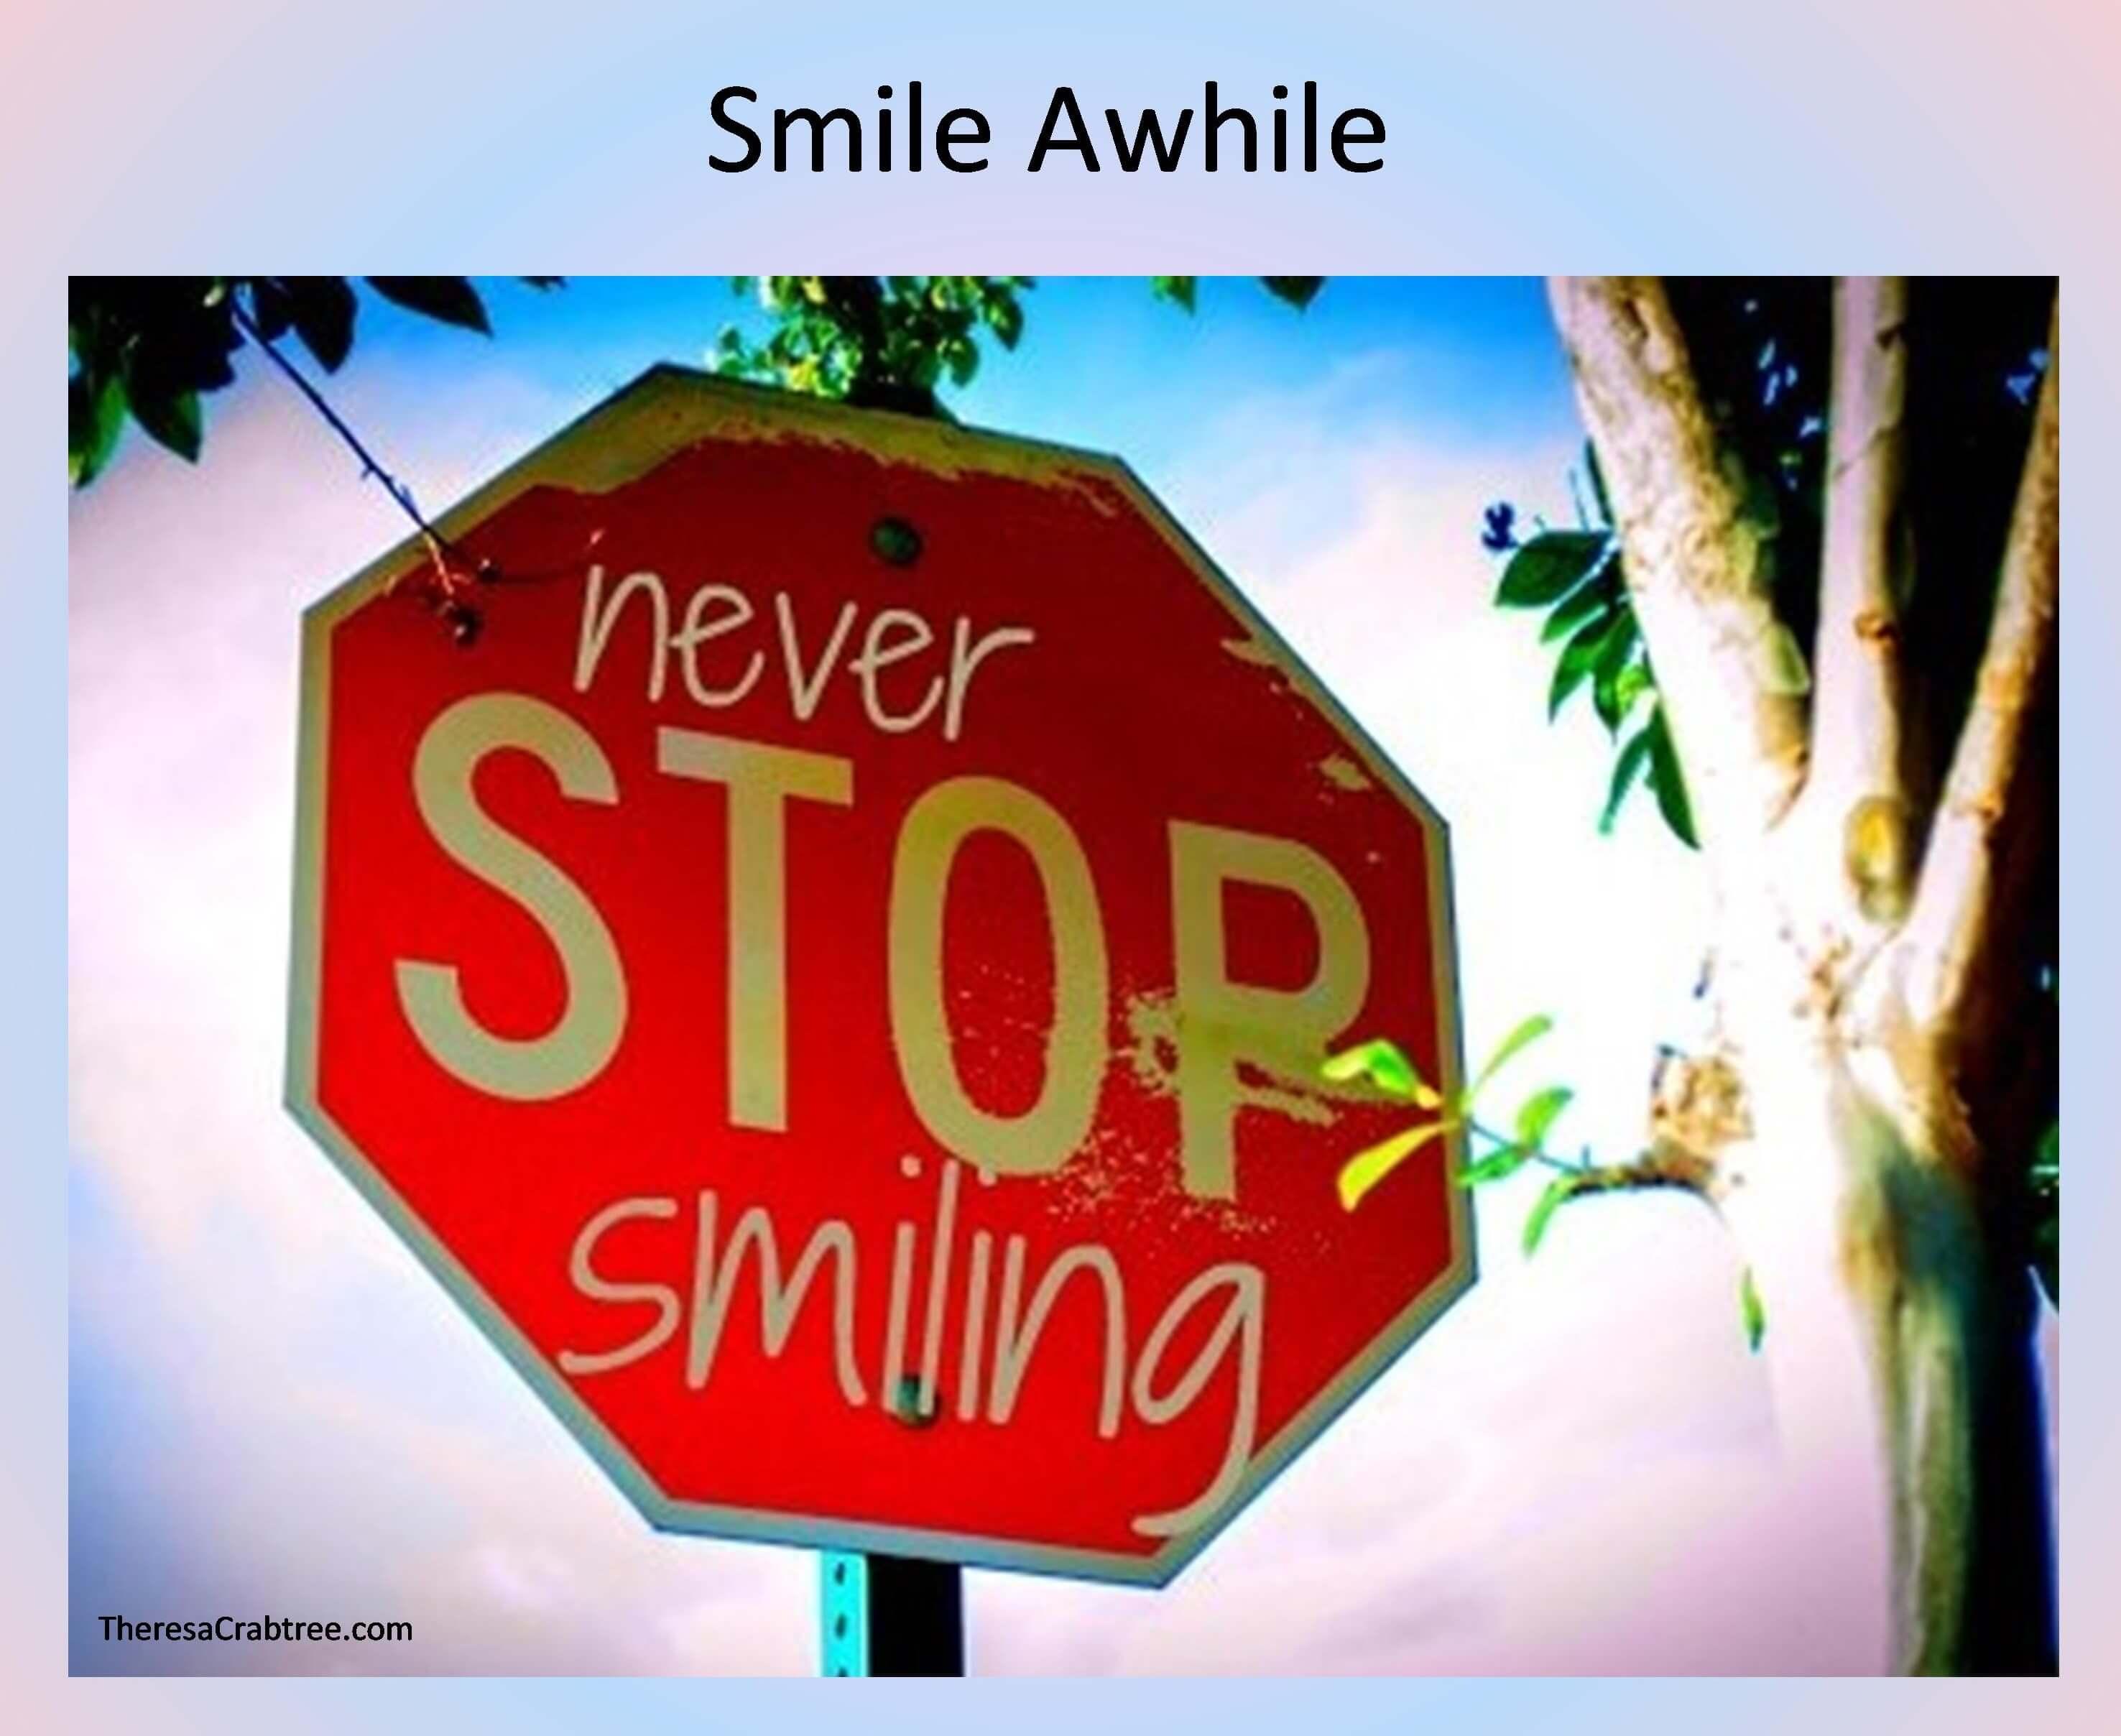 Smile Awhile